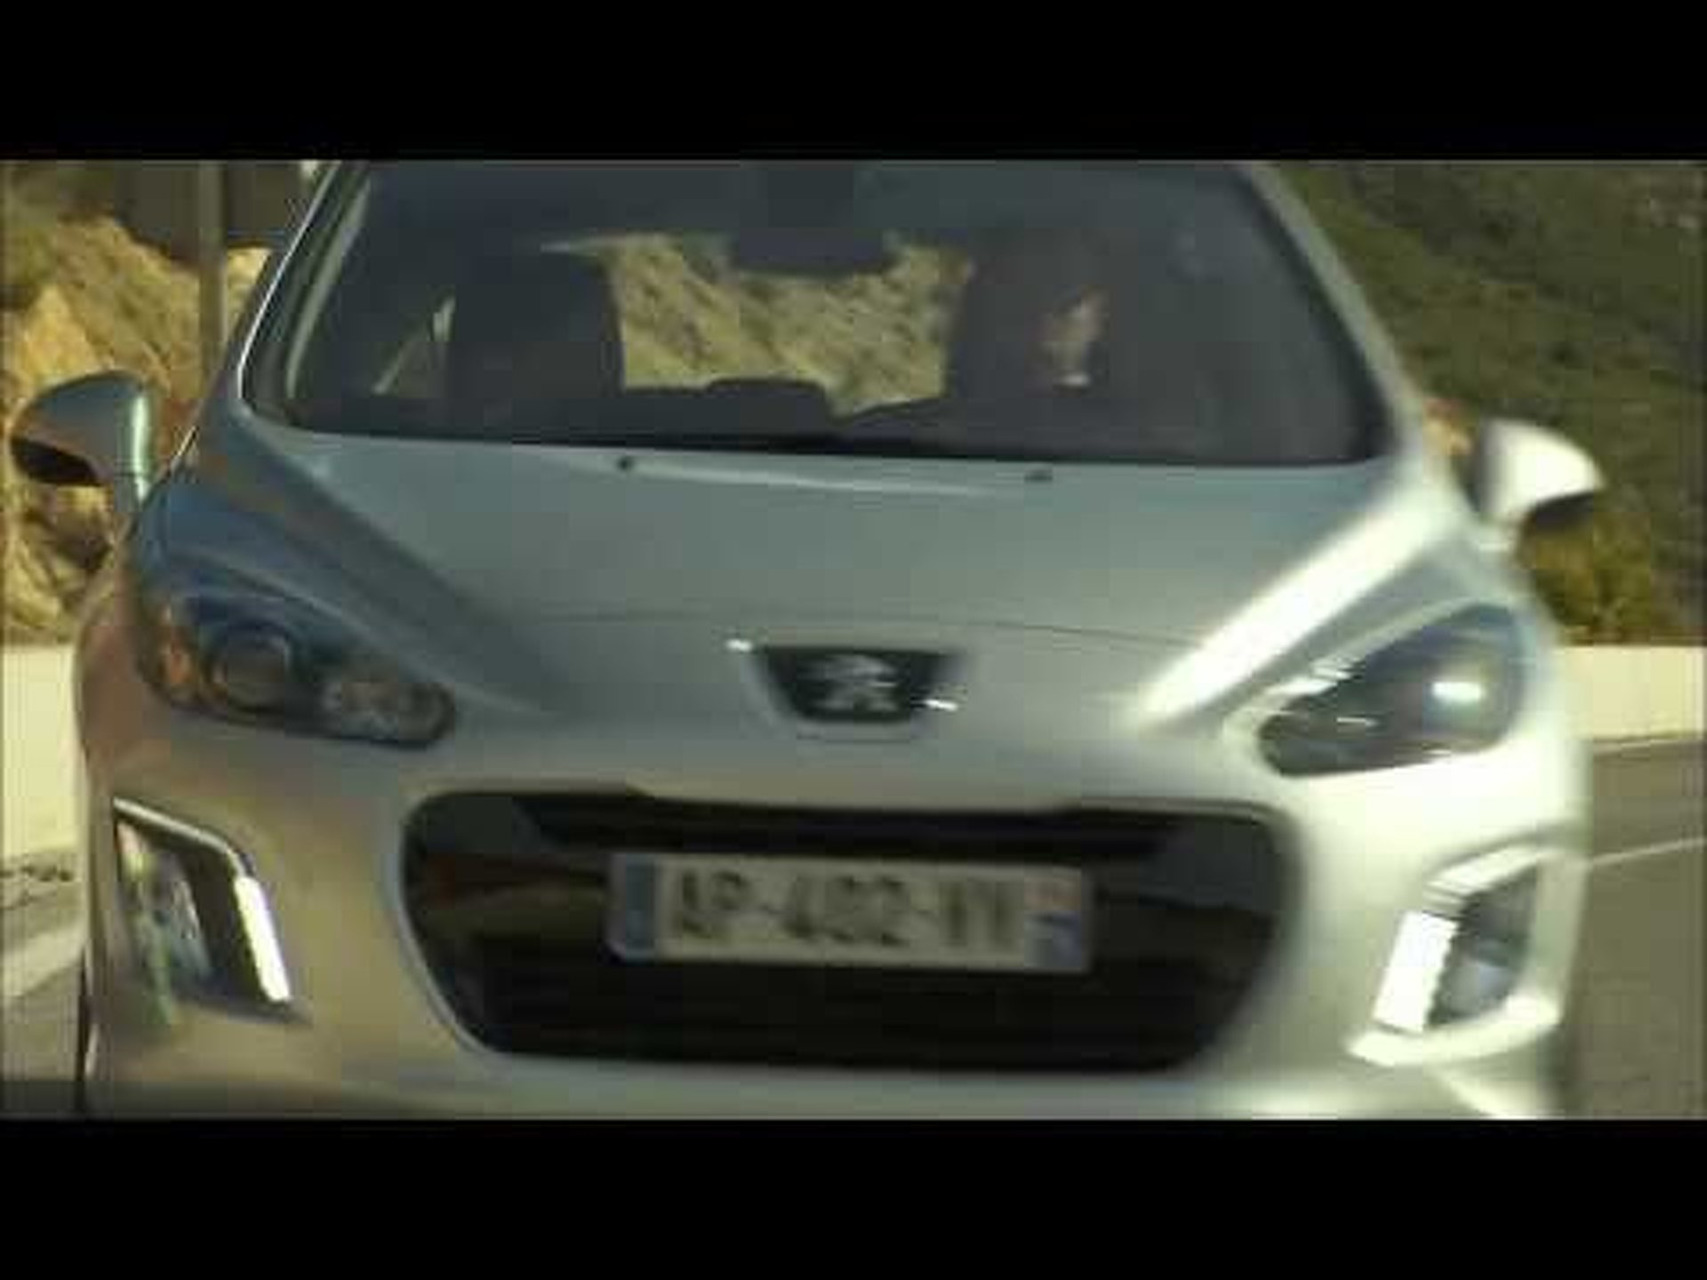 ► Peugeot 308 facelift 2012